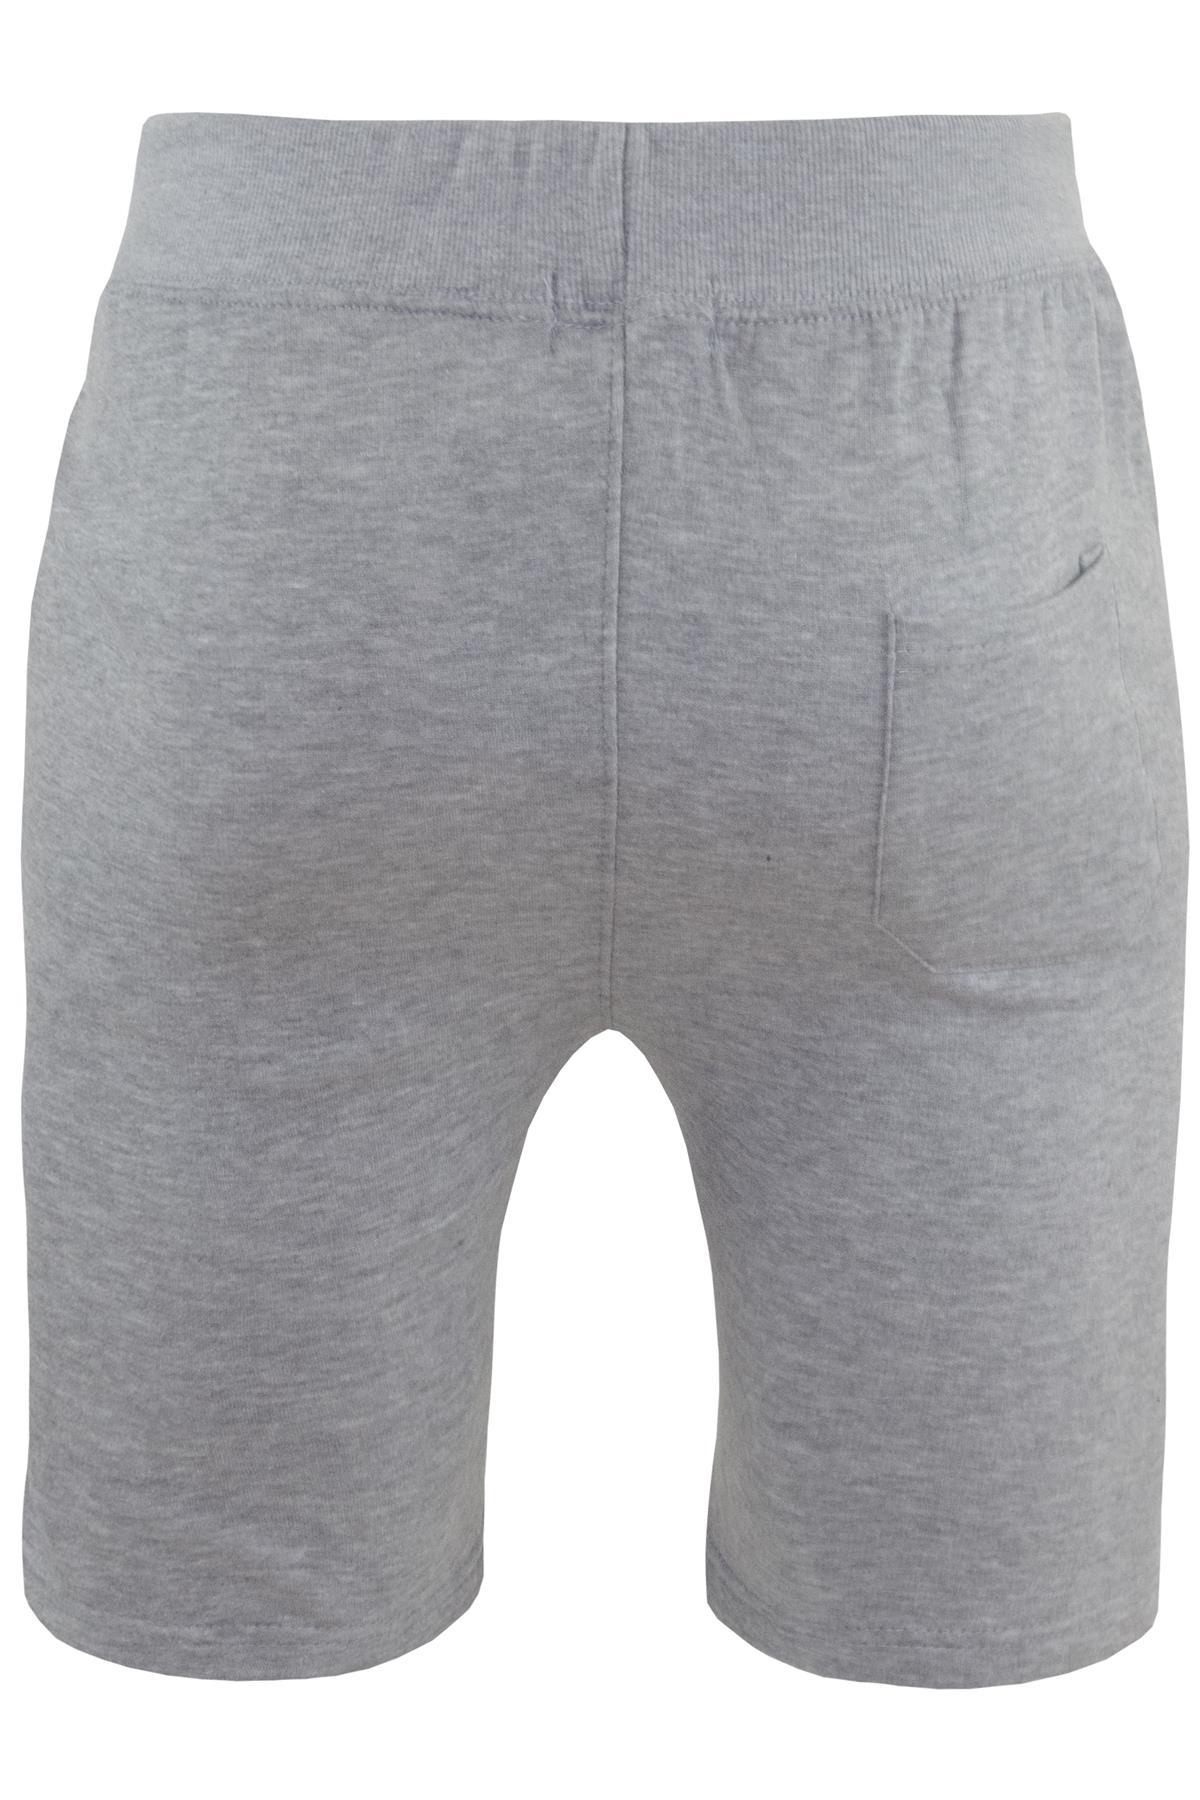 Mens-Contrast-Panel-Running-Summer-Side-Slit-Knee-Length-Fleece-Bottoms-Shorts thumbnail 62